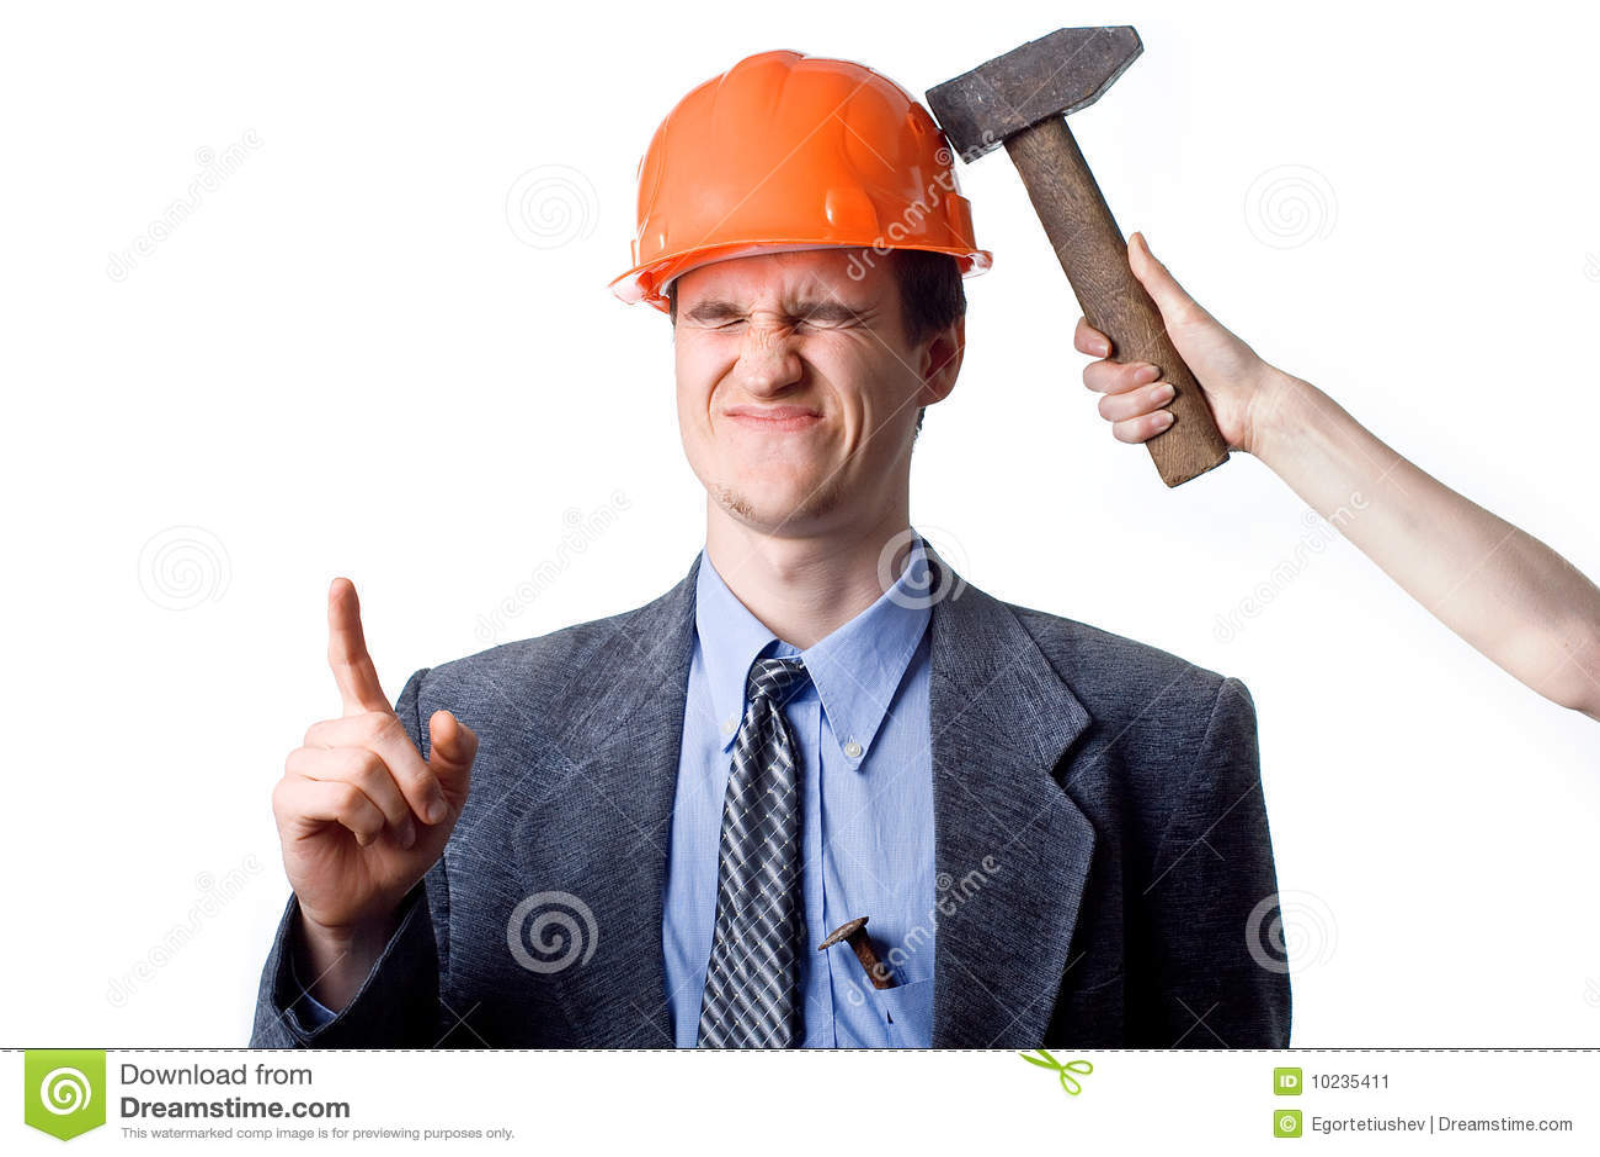 Hammer beat